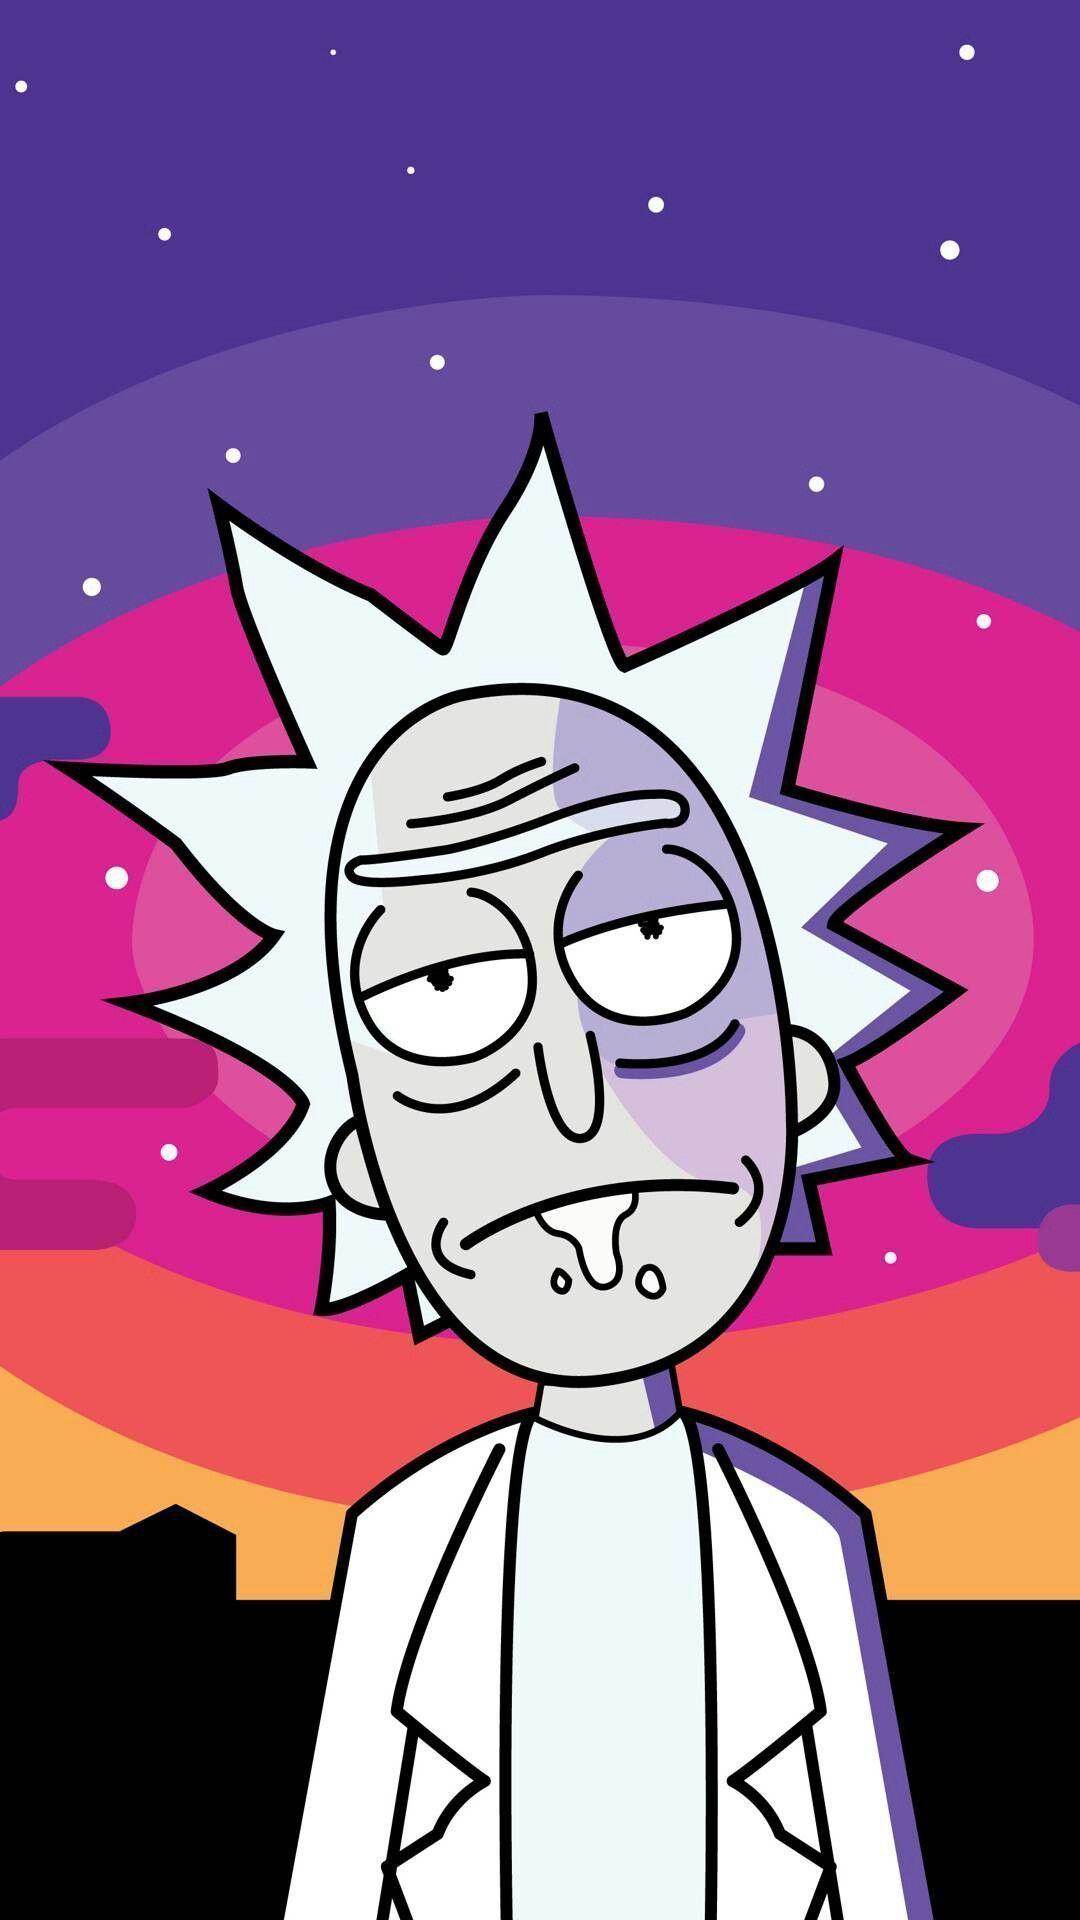 Join Rick And Morty On Thefandome Com And Get Free Access To Advanced Geek Blogging Thefandom Cartoon Wallpaper Graffiti Zeichnung Psychedelische Zeichnungen